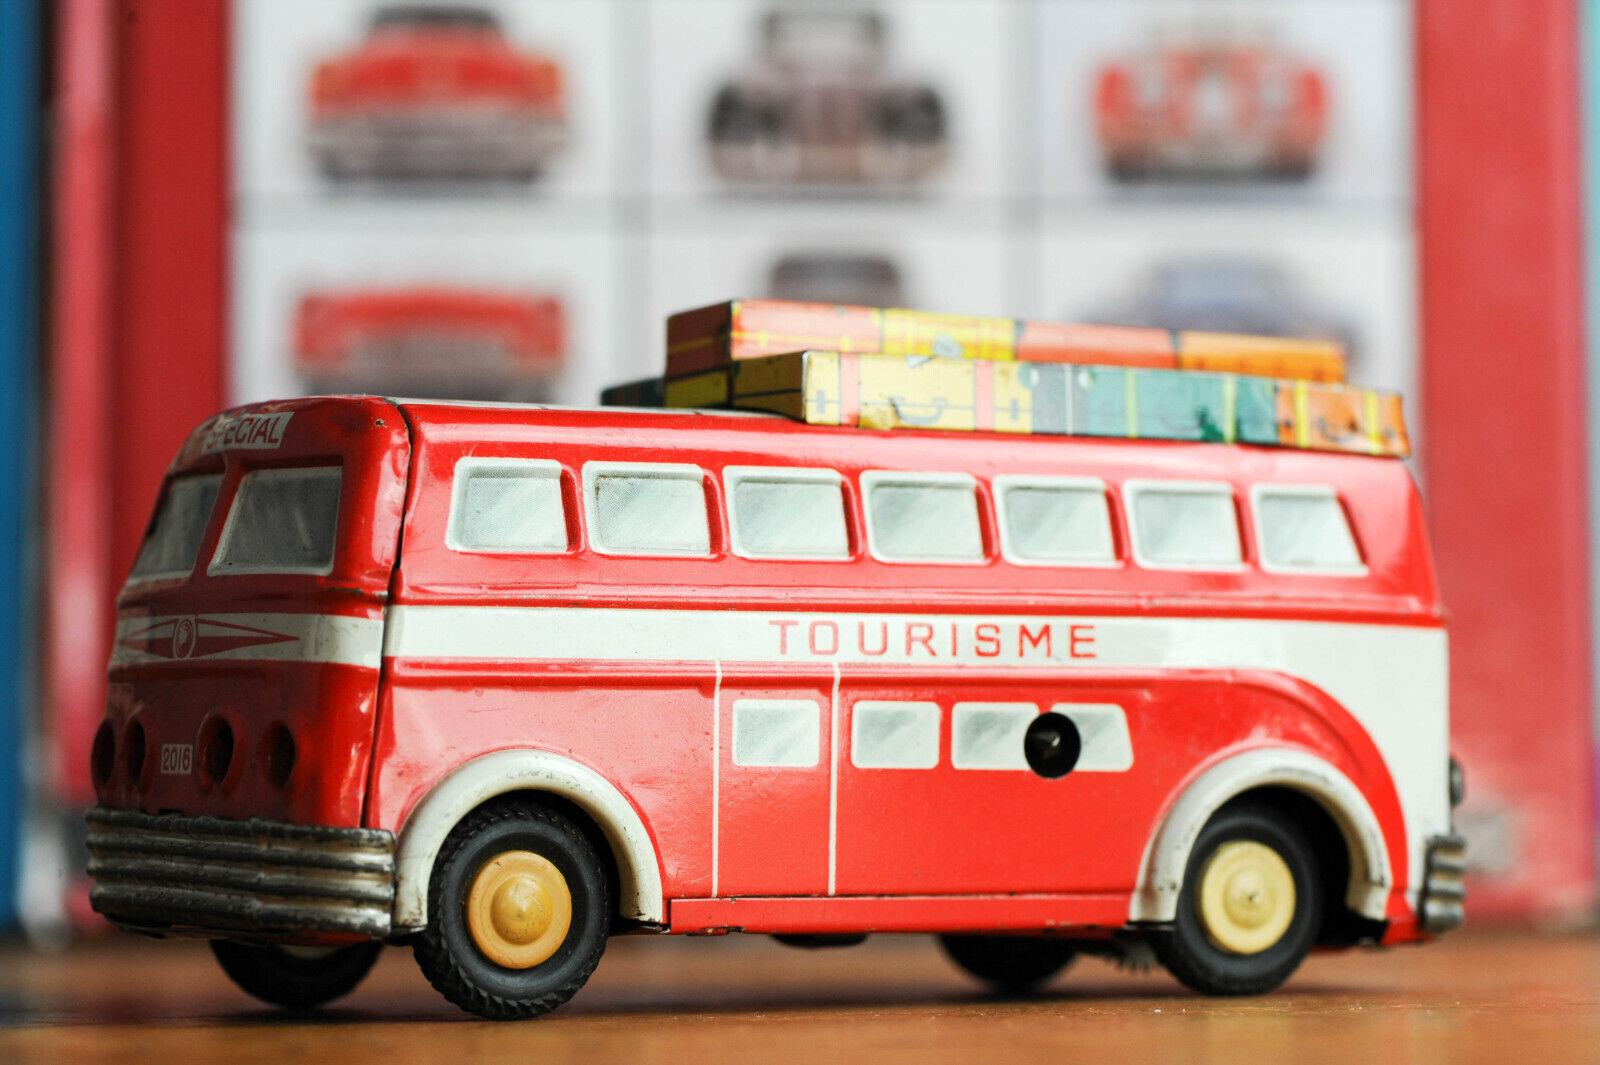 Antique De Estaño Juguete trabajando Joustra Francia XVI Bus Touring Car artículo Raro